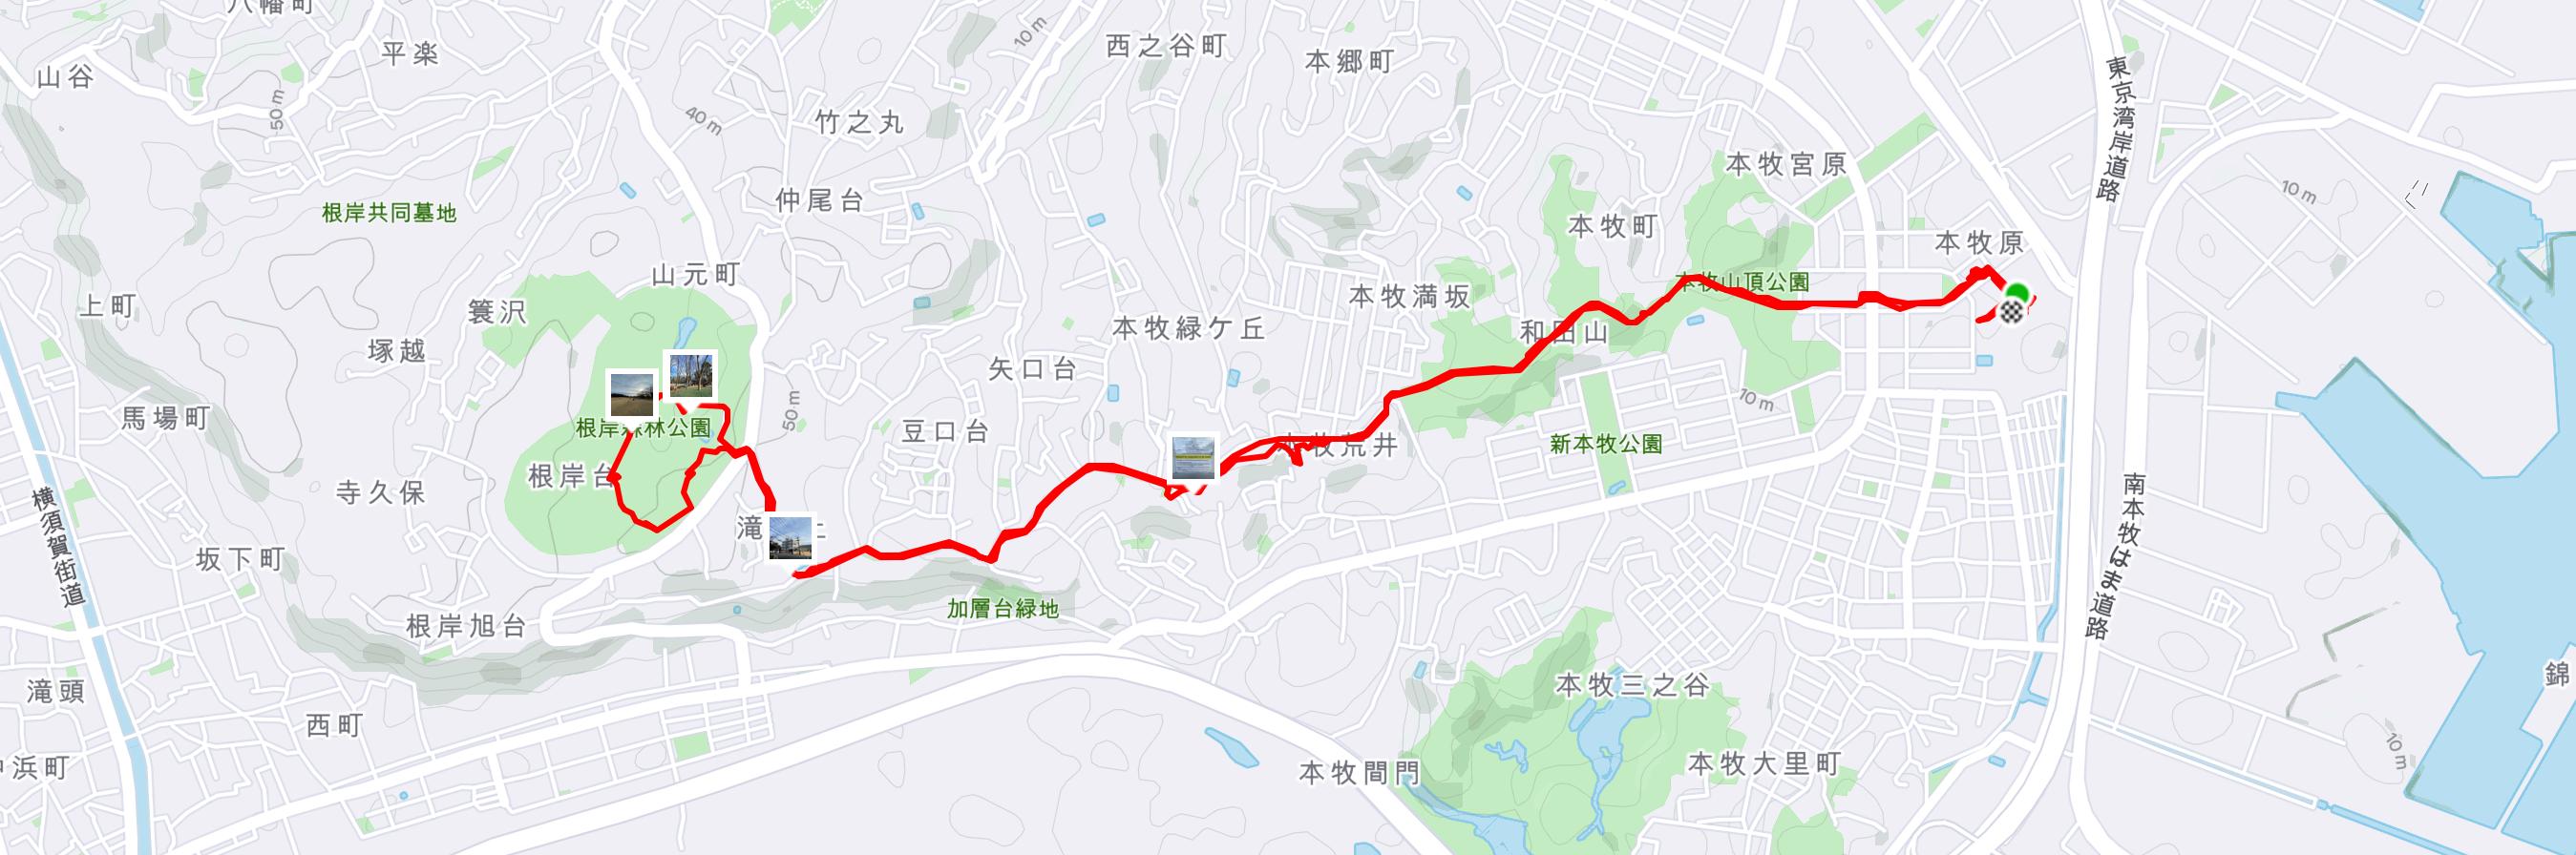 8,5 kilometri